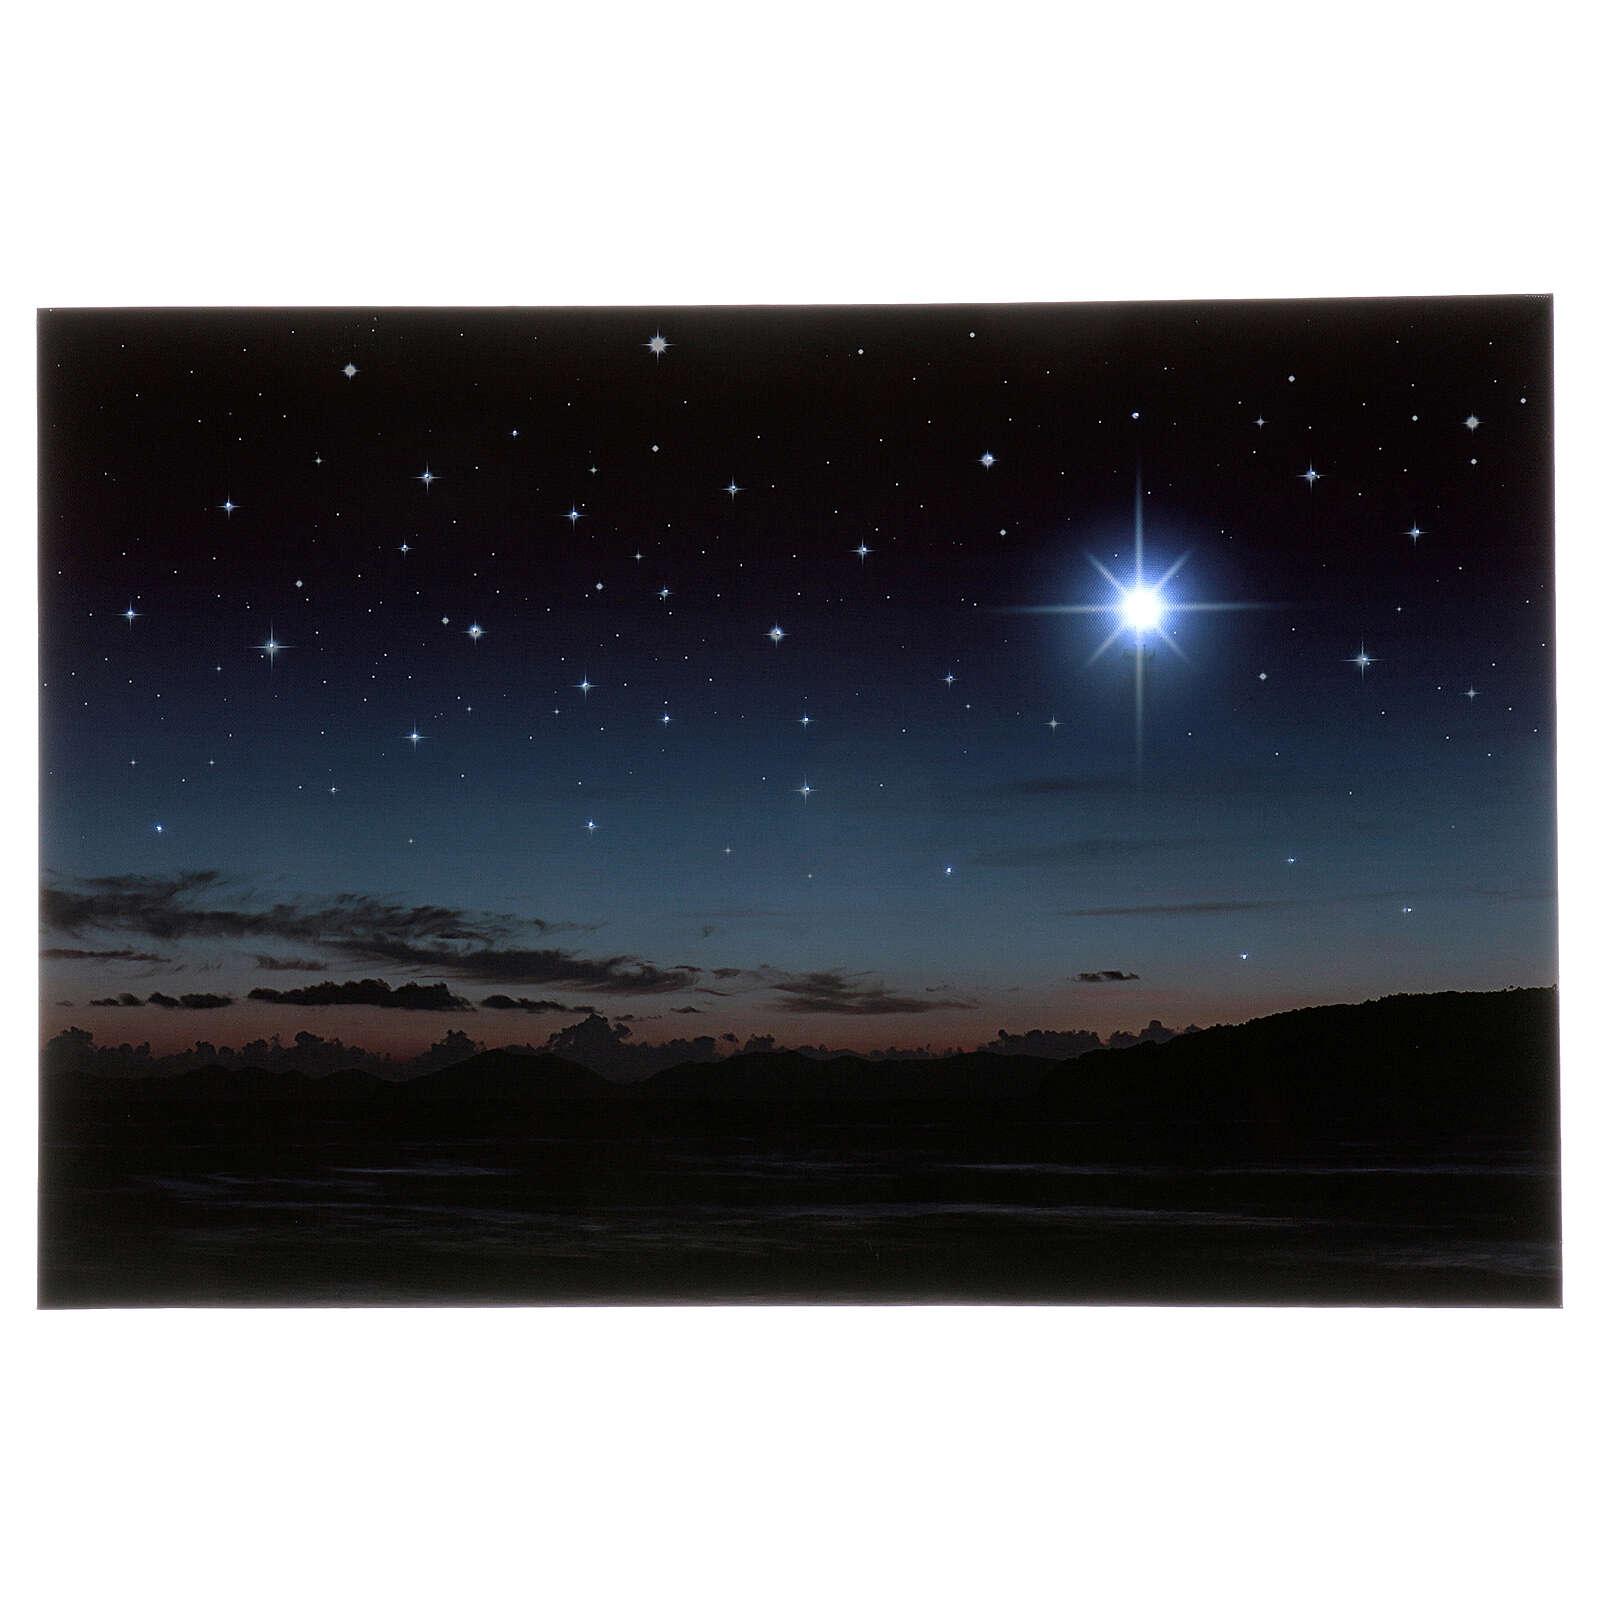 Illuminated backdrop mountains and pole star, 40x60 cm 4